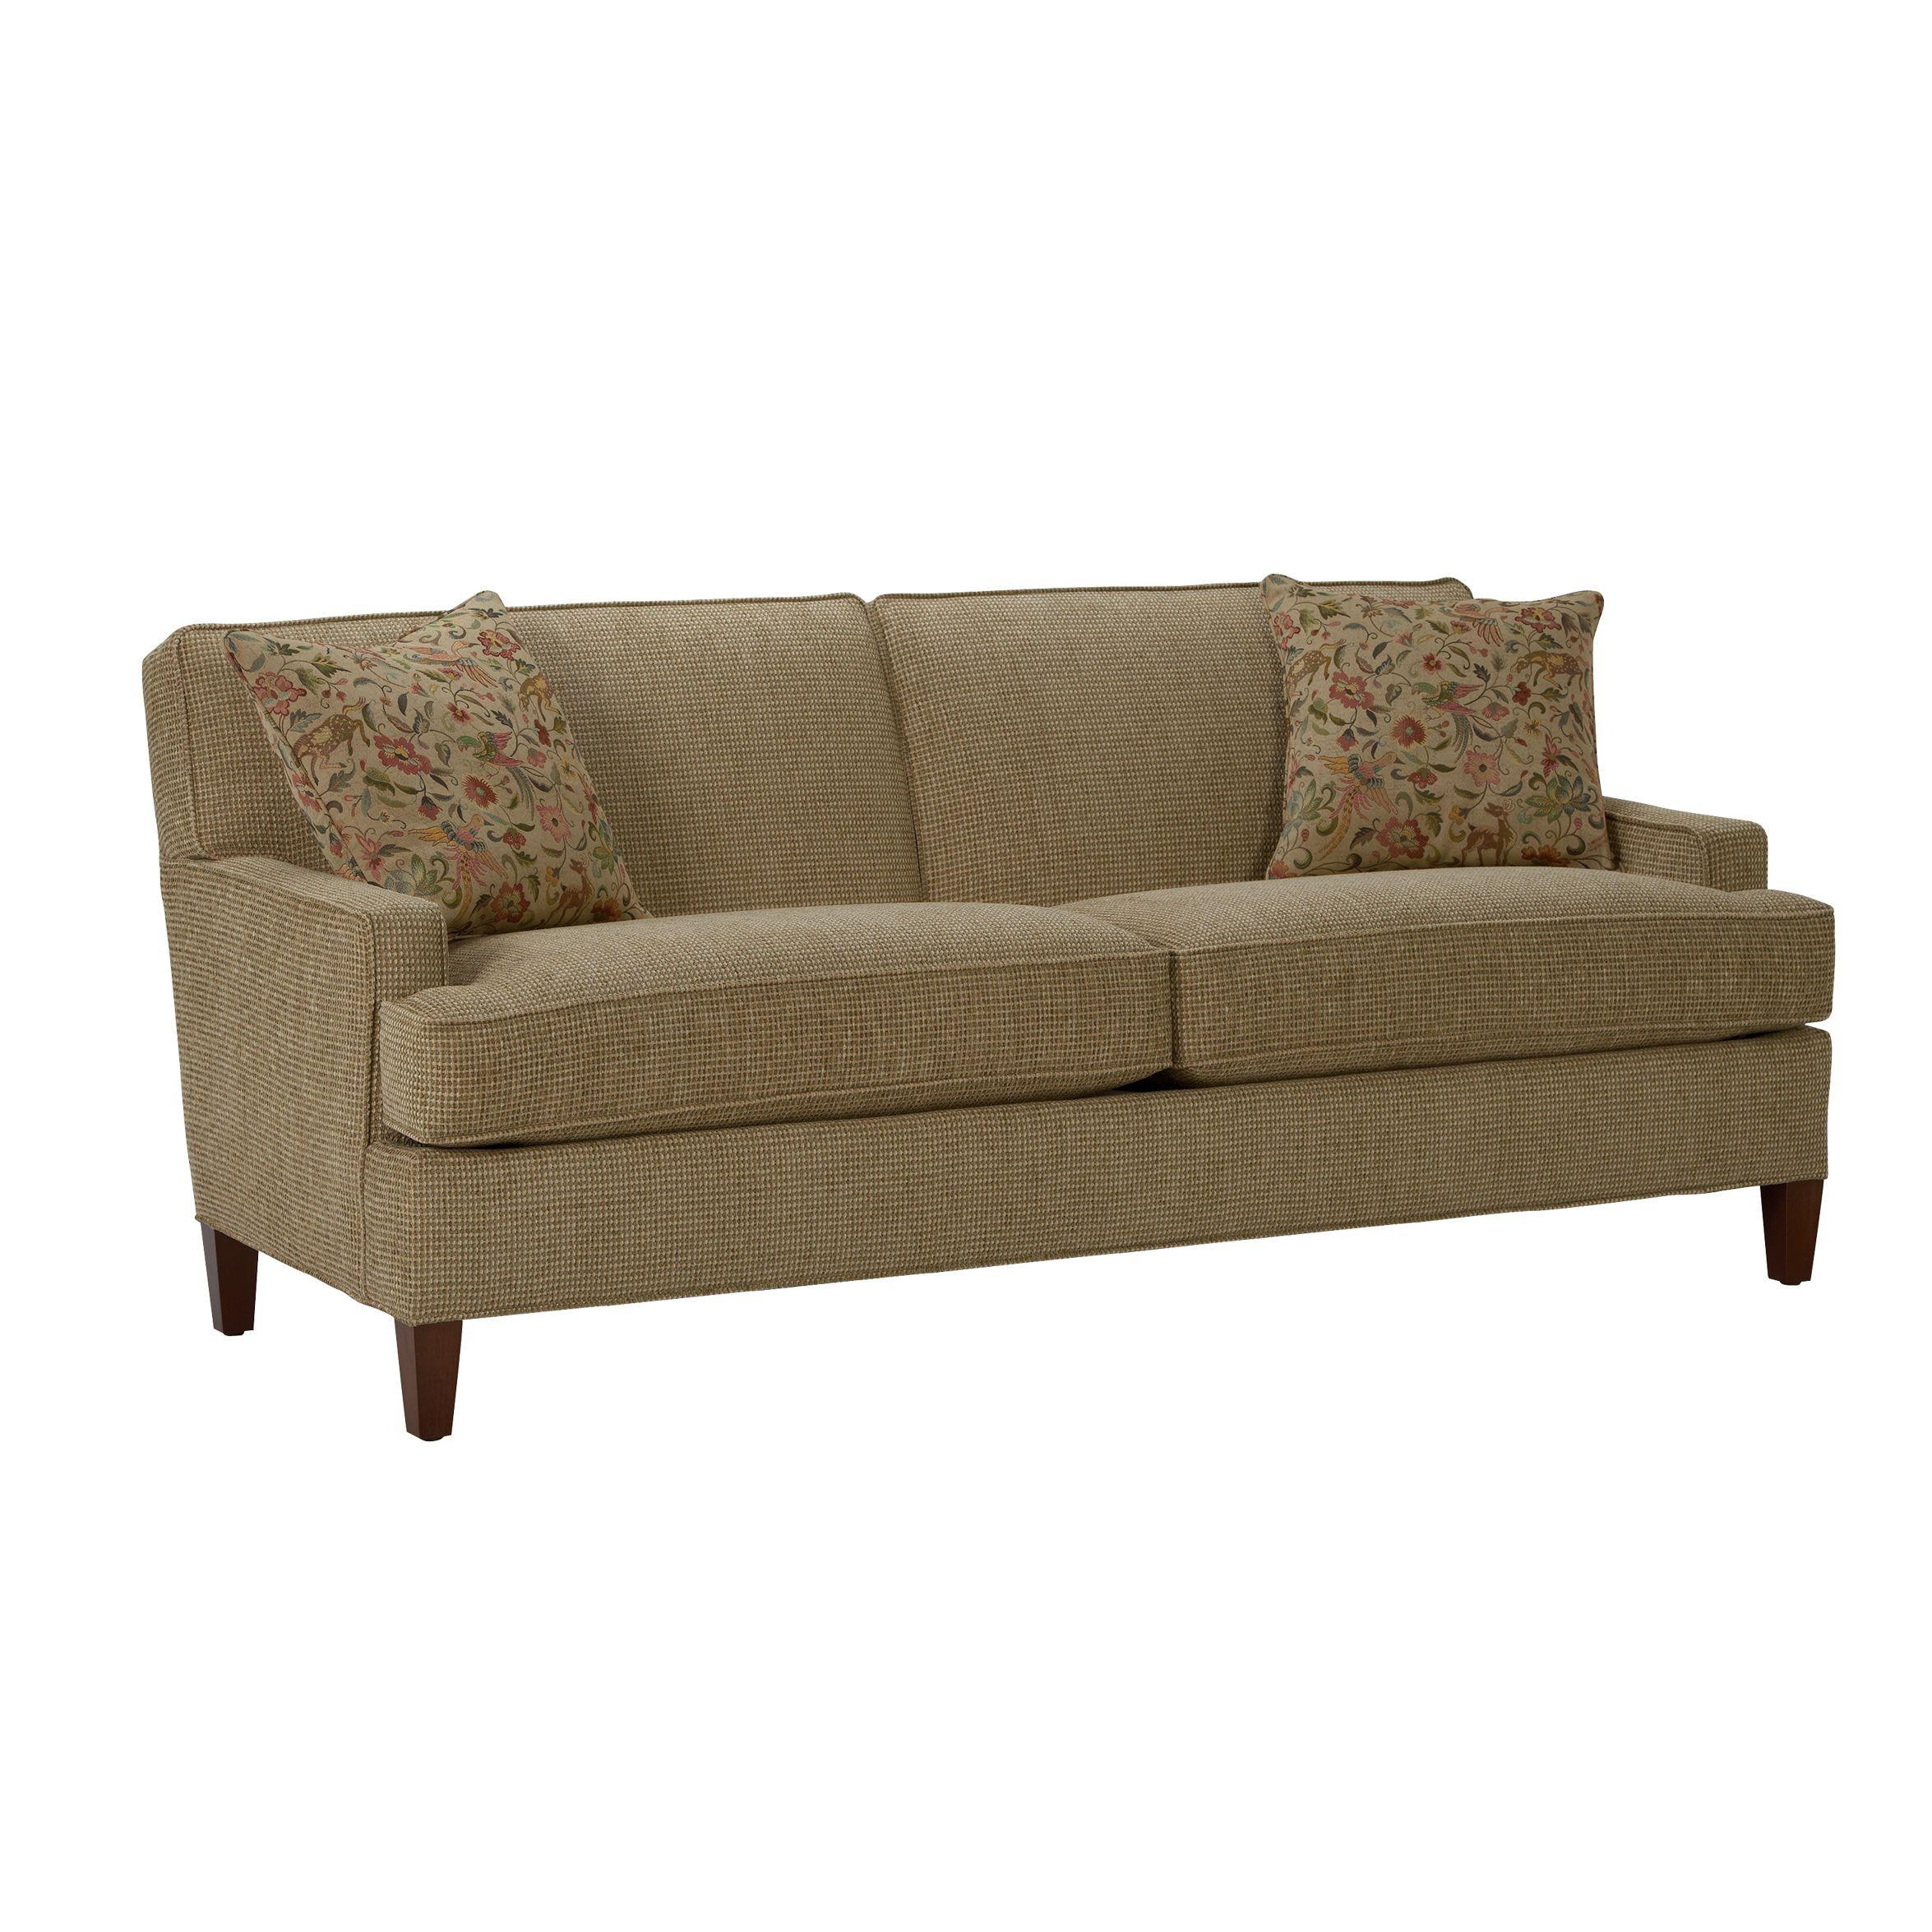 Strange Upholstery Furniture Tip Do Not Remove Cushion Covers For Creativecarmelina Interior Chair Design Creativecarmelinacom